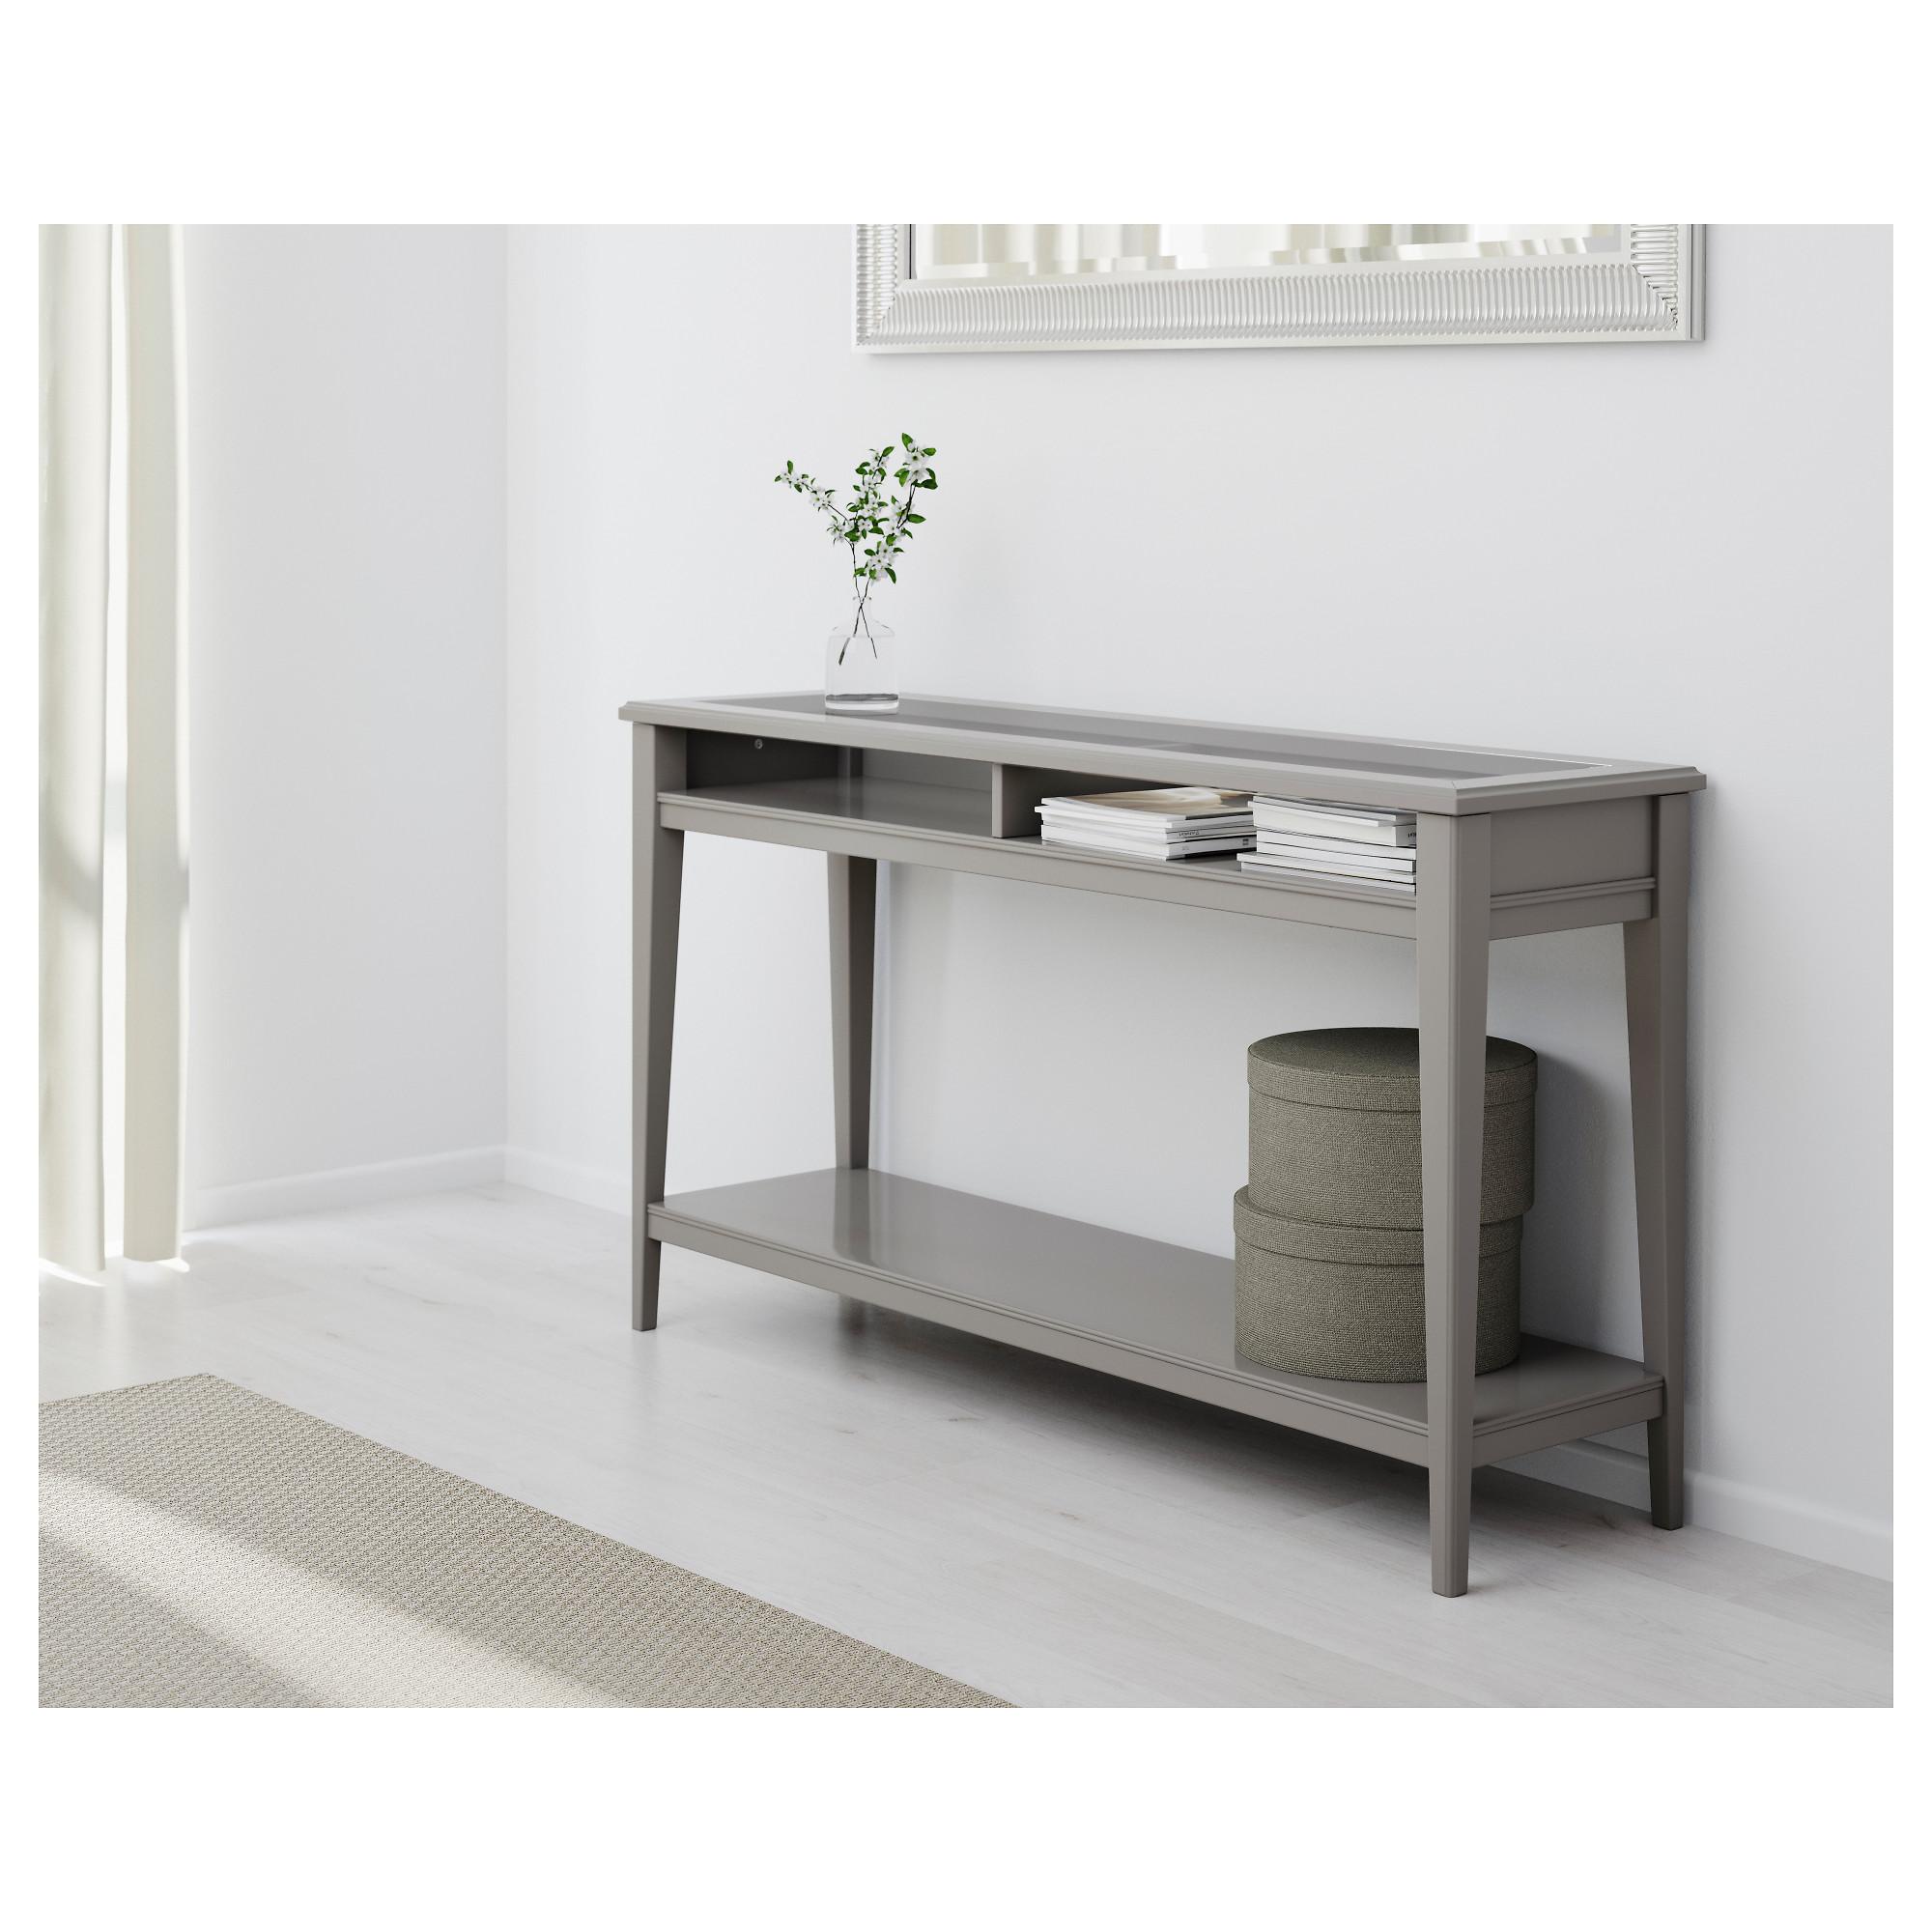 sofa table liatorp console table - white/glass - ikea ELPSXFD